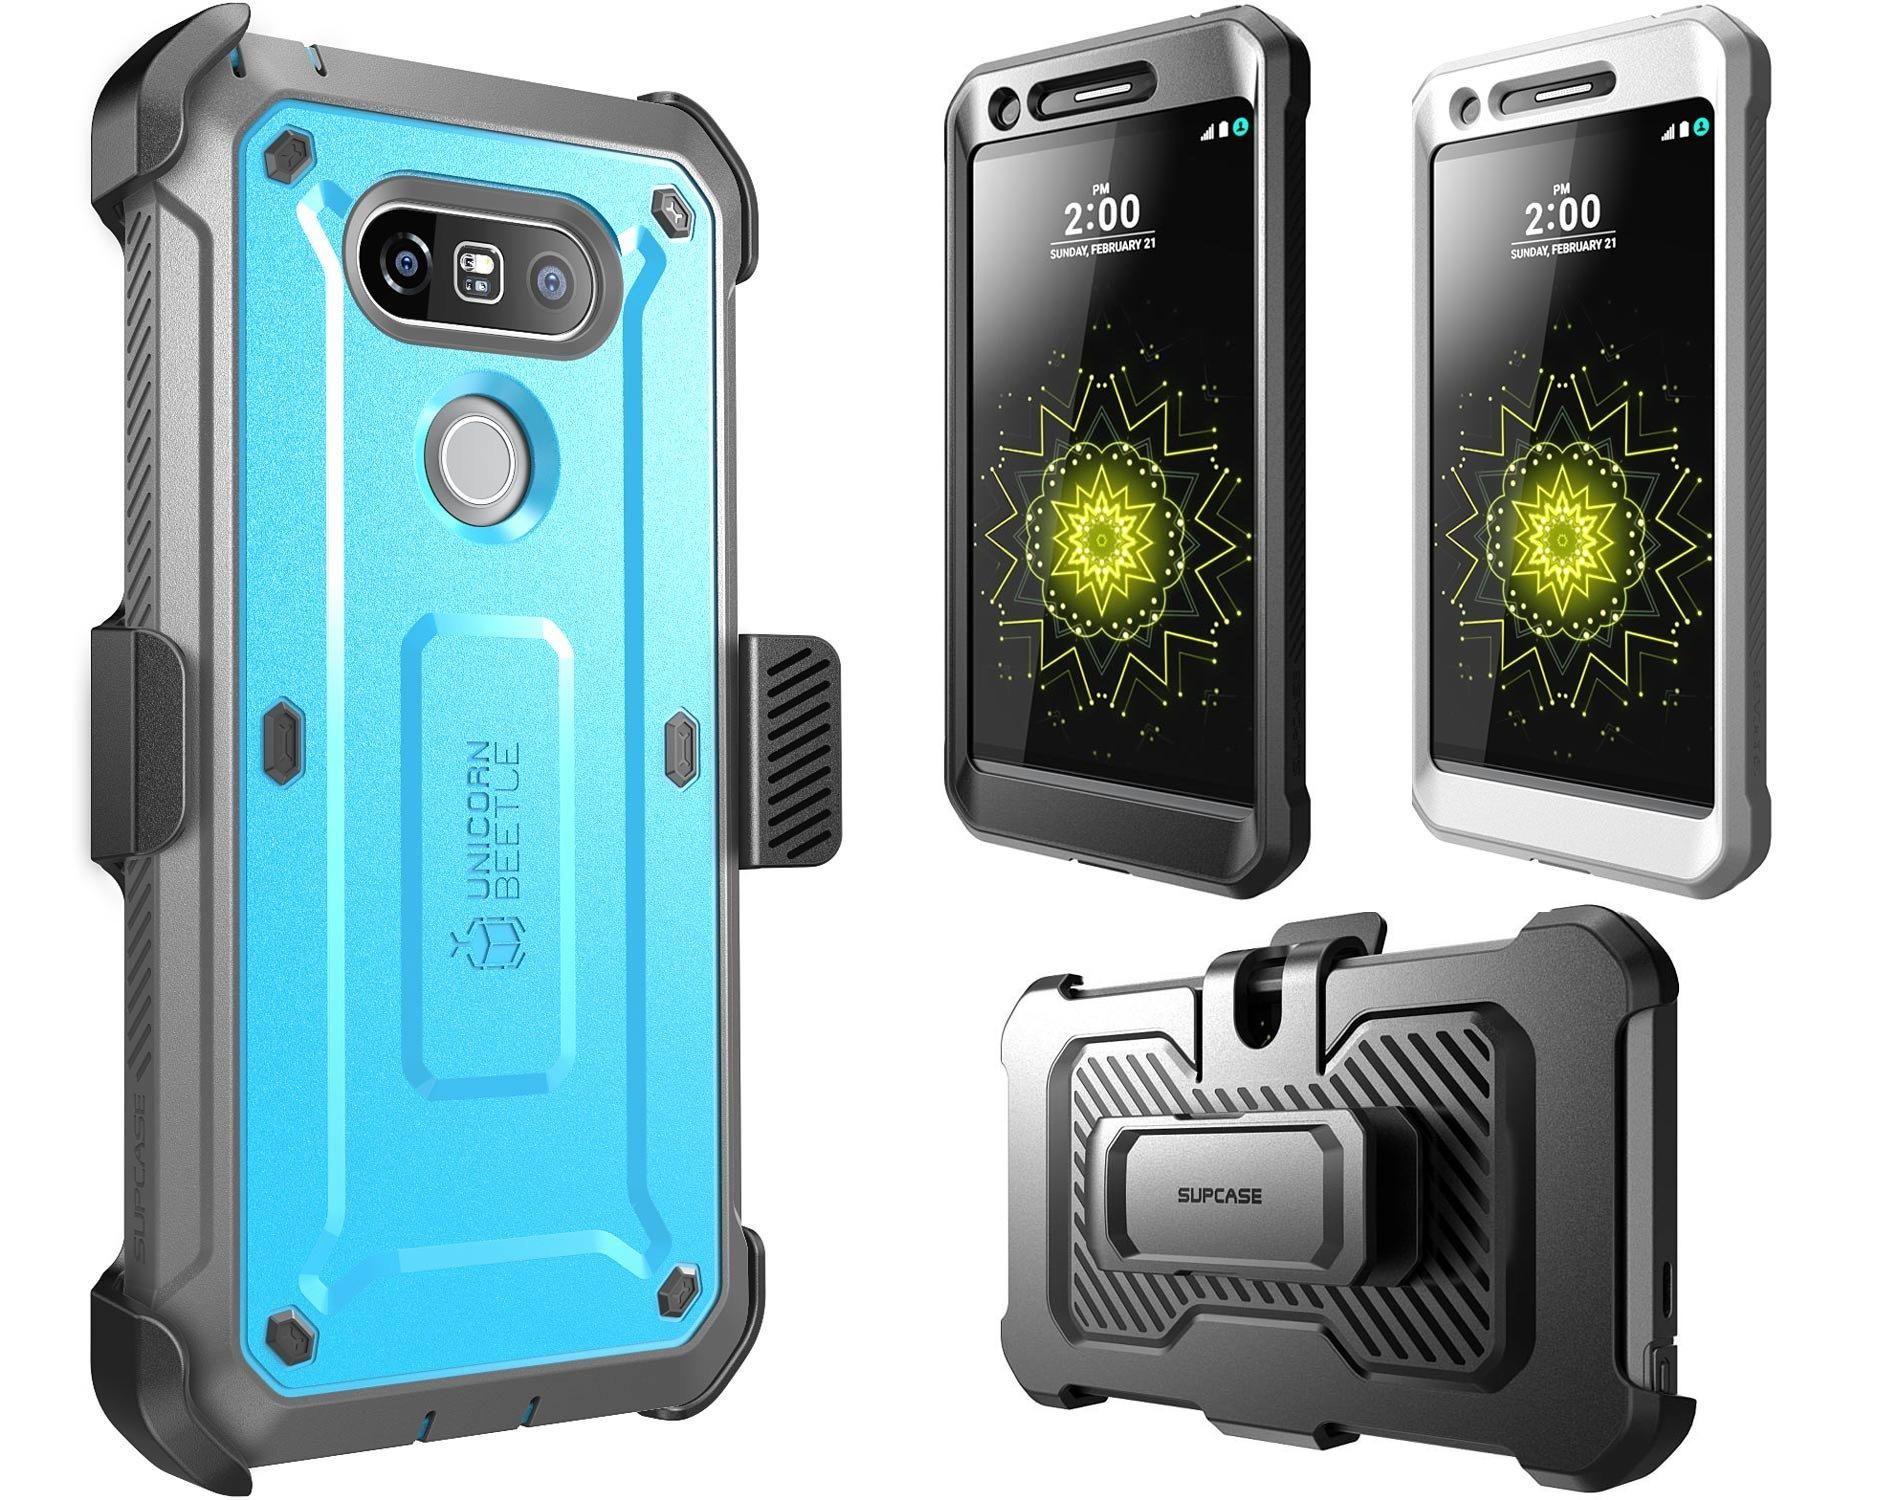 LG G5 Case Rugged Holster